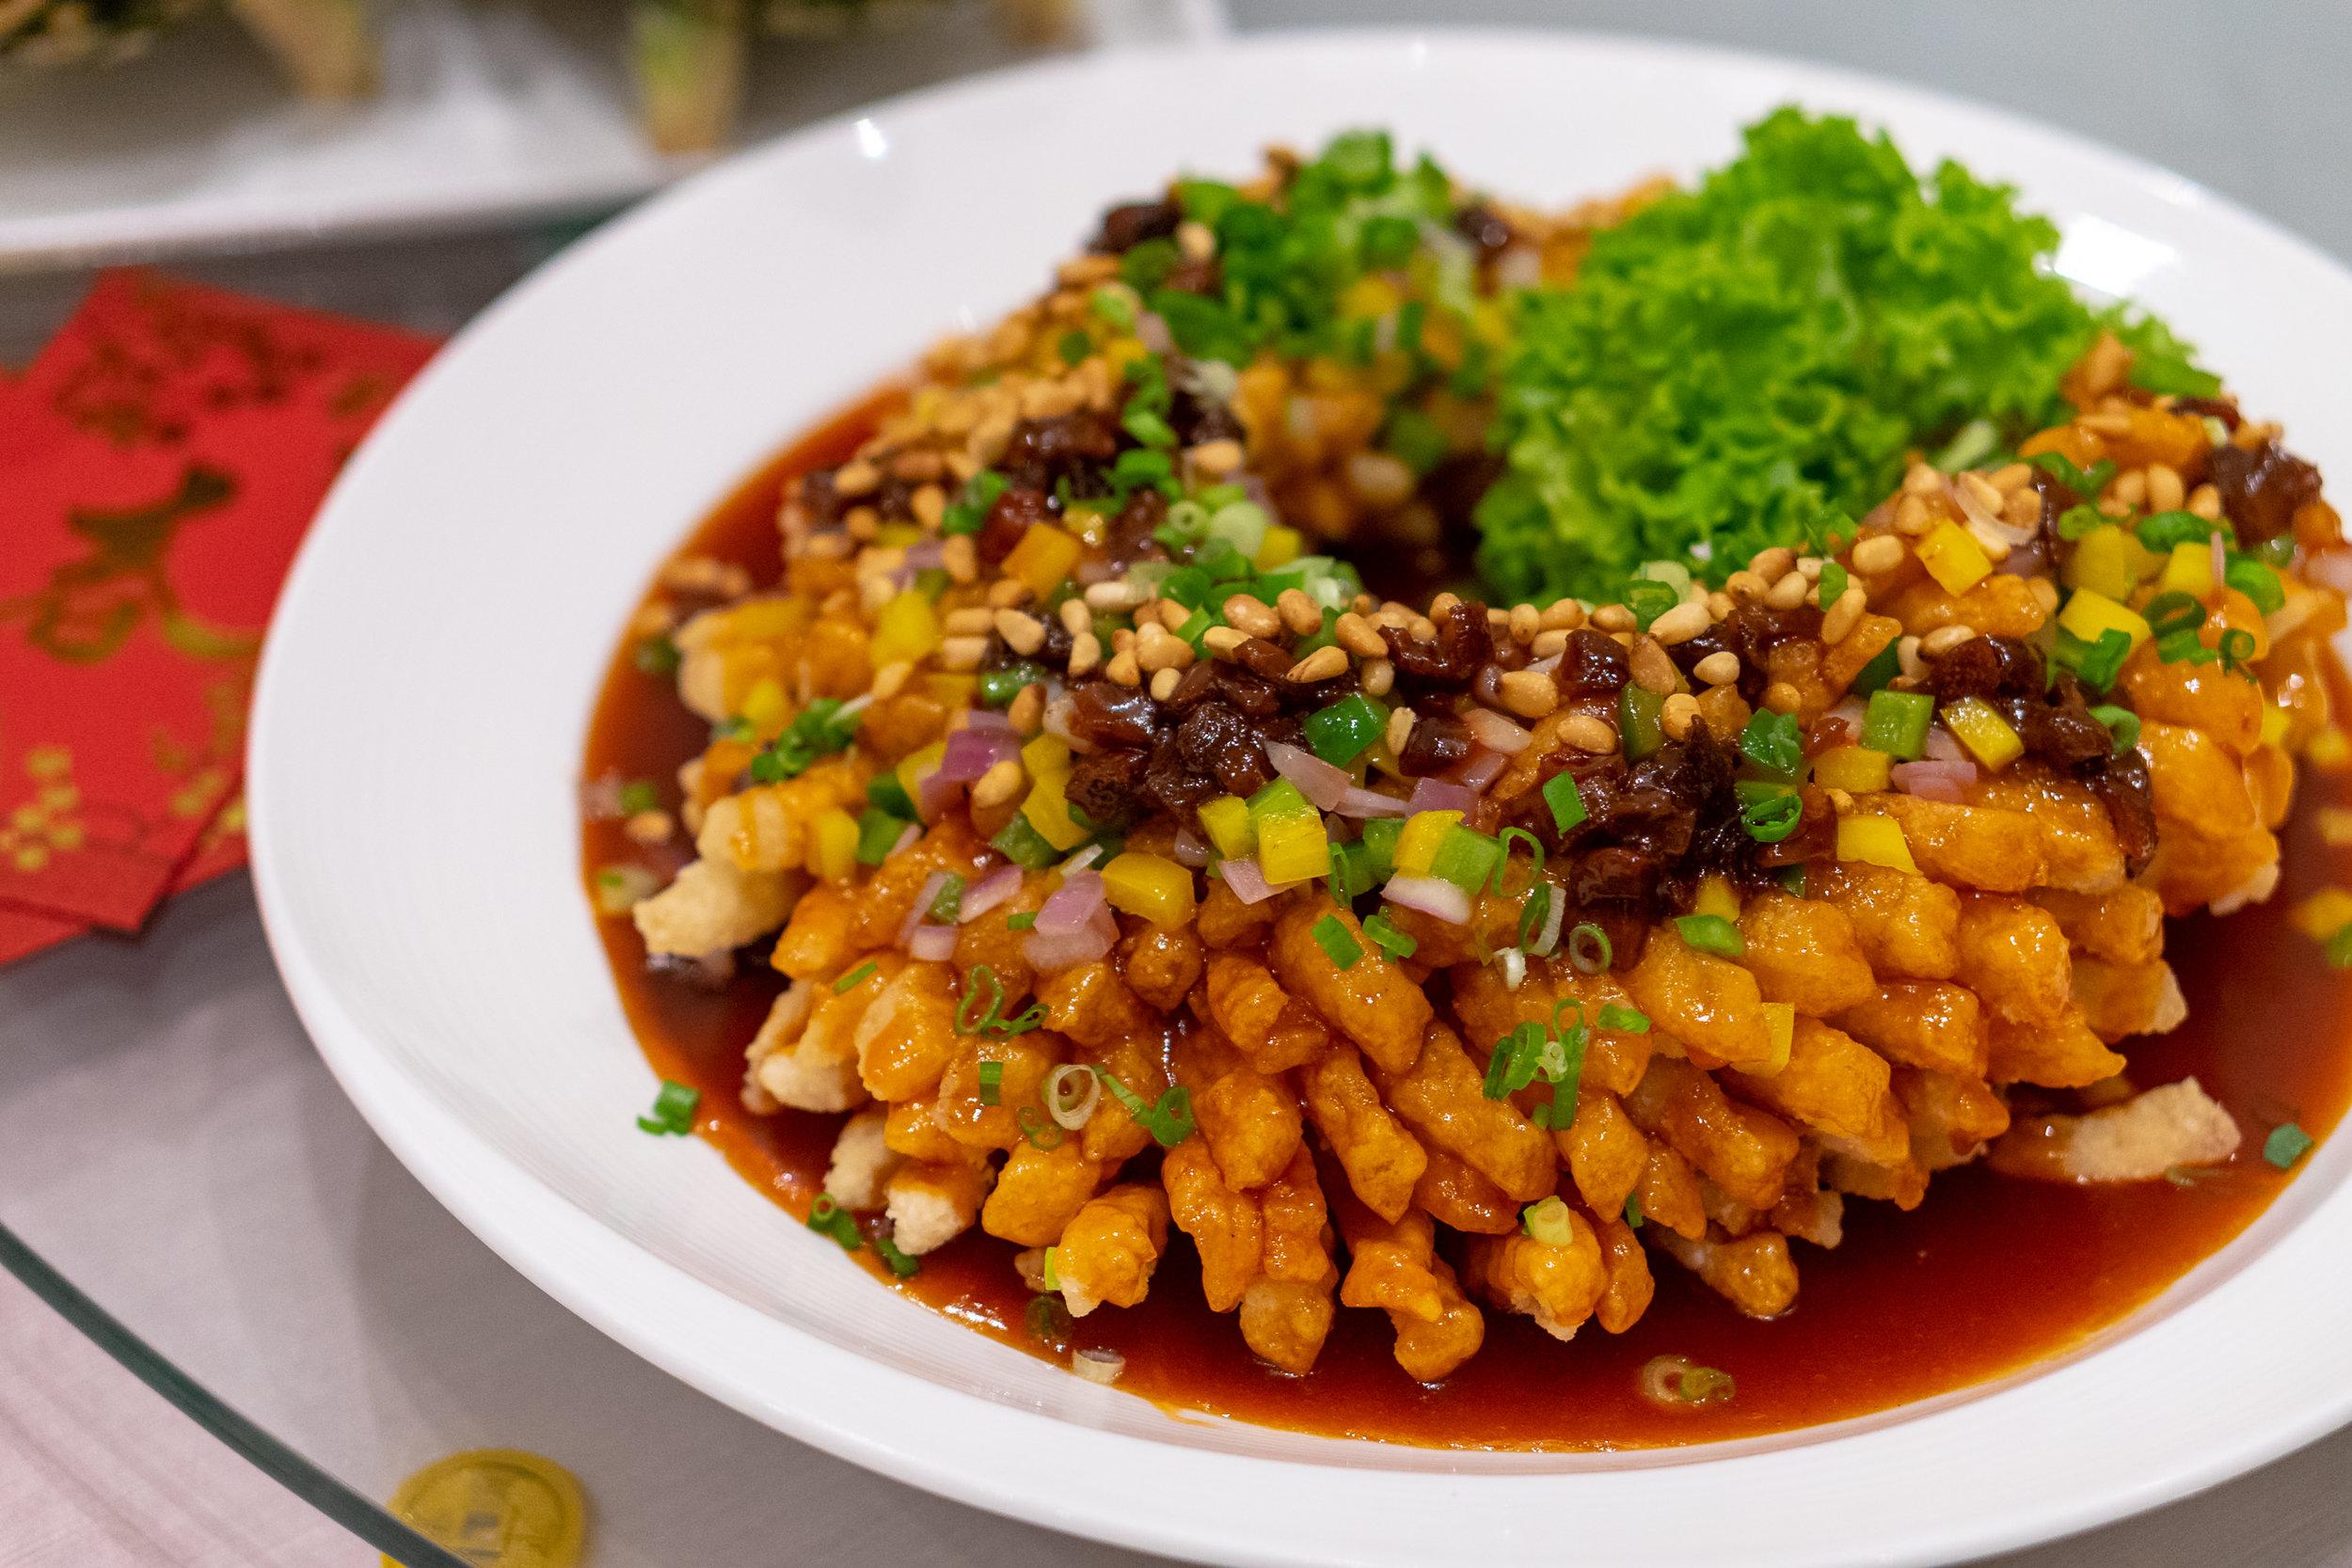 Full of Luck Deep-fried Chilean Seabass with Hawthorn Sauce 福禄盈余 – 山楂糖醋松子鱼